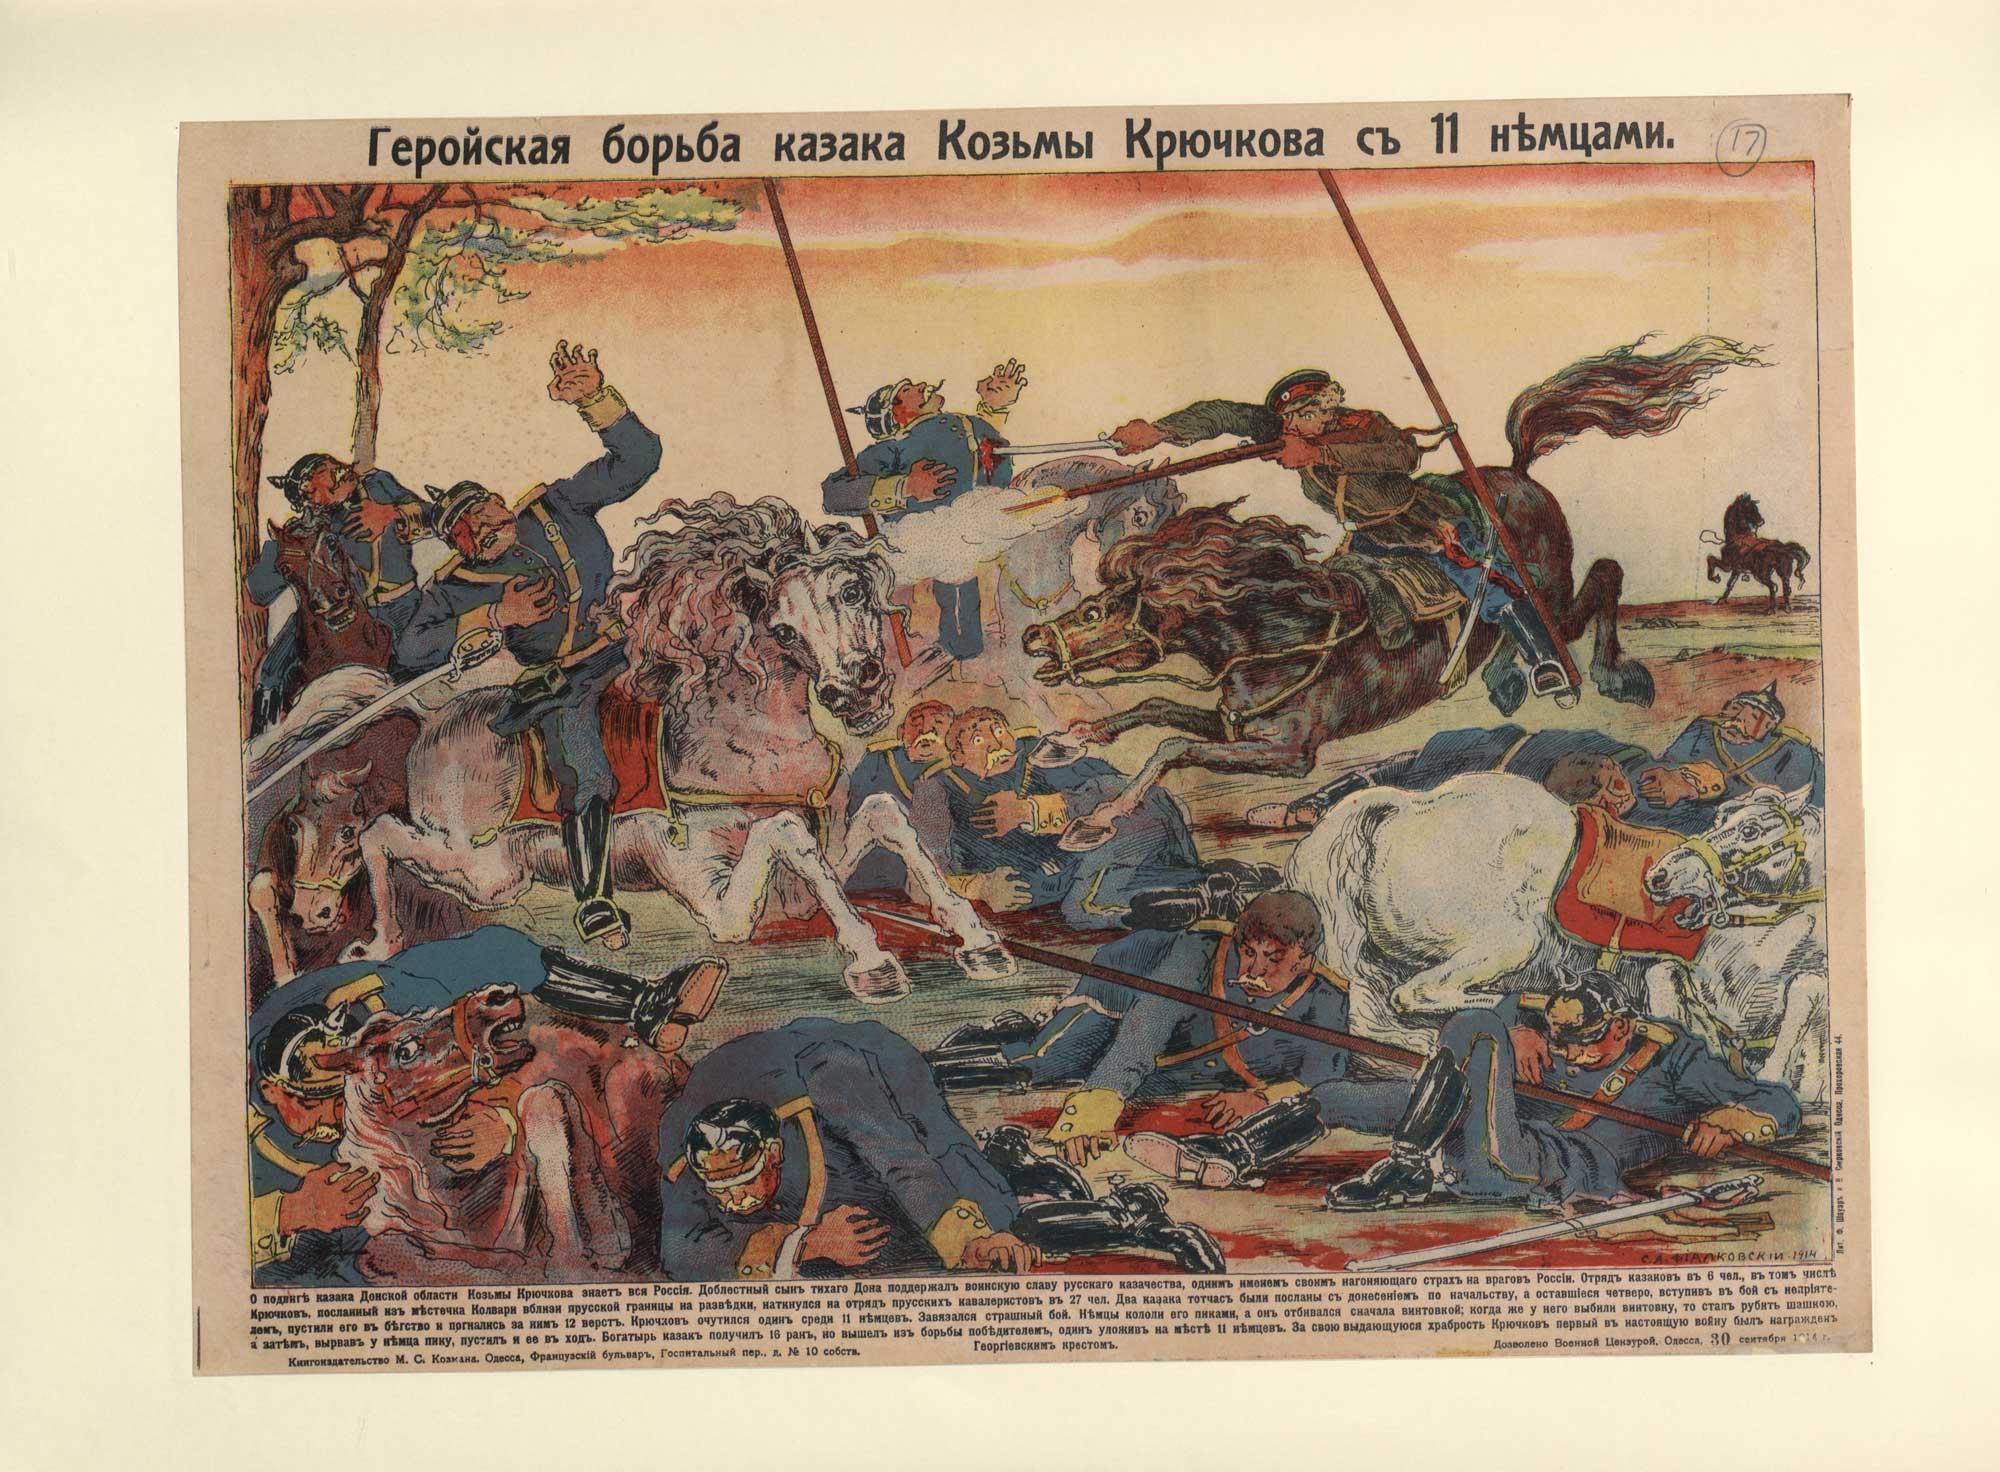 A heroic battle of the Cossack Kozma Kriuchkov with 11 Germans